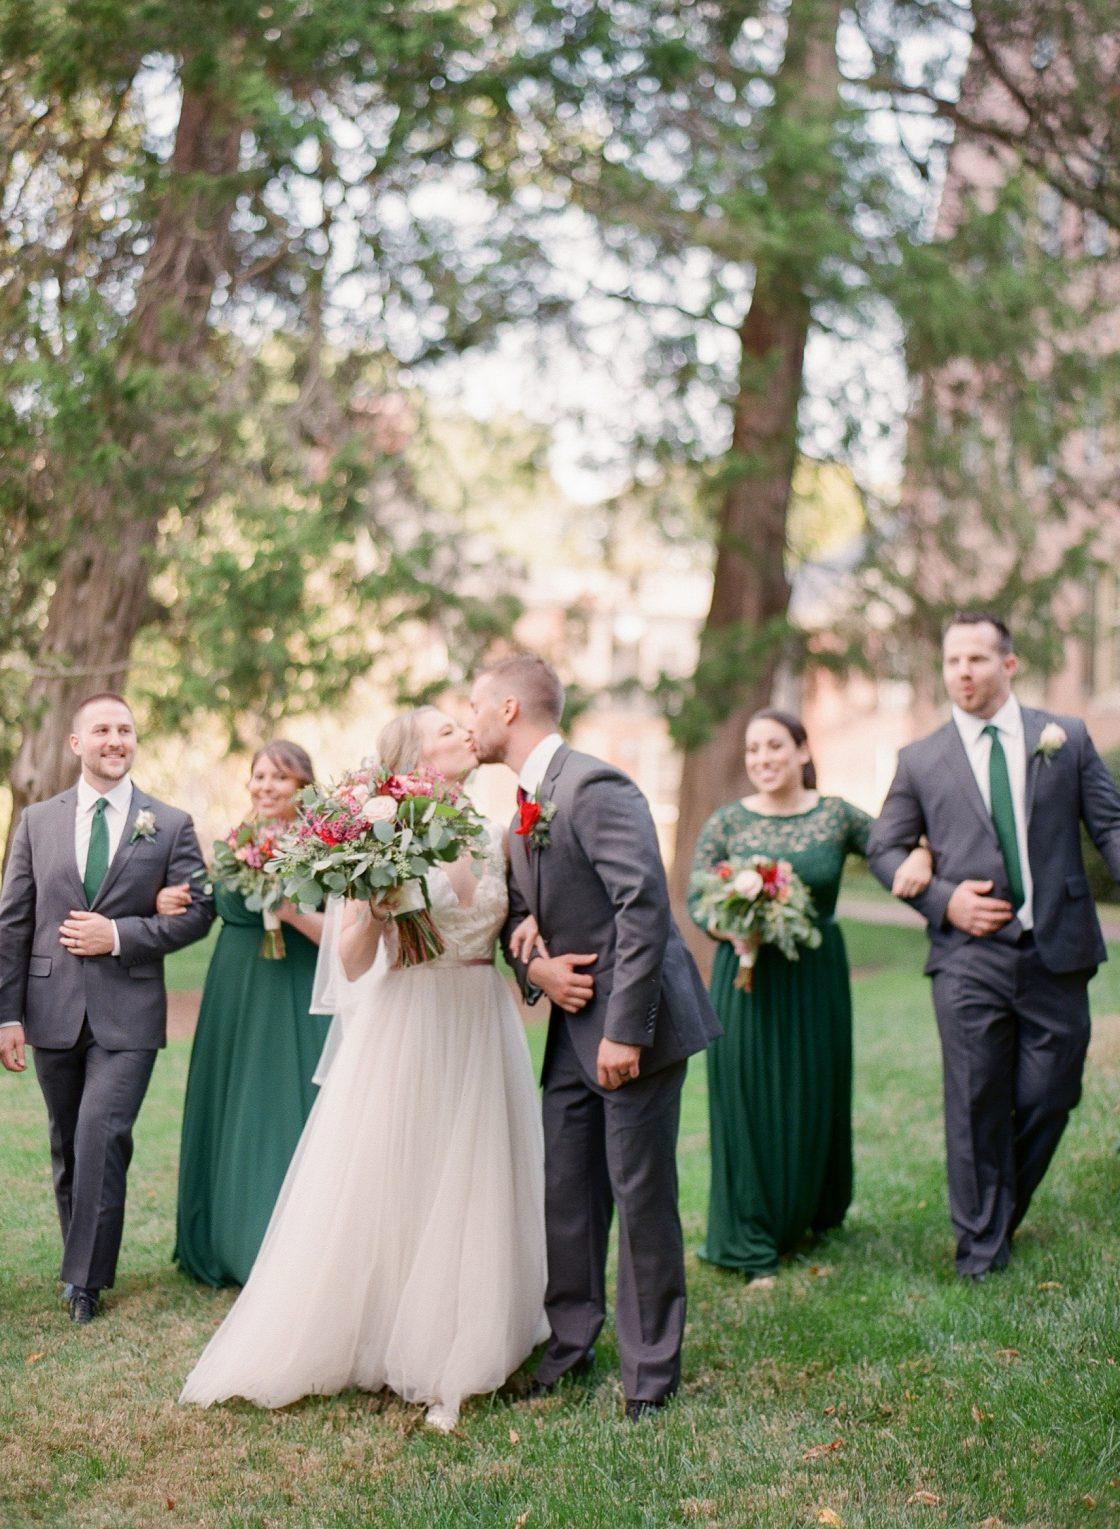 Romantic Bridal Party Photo